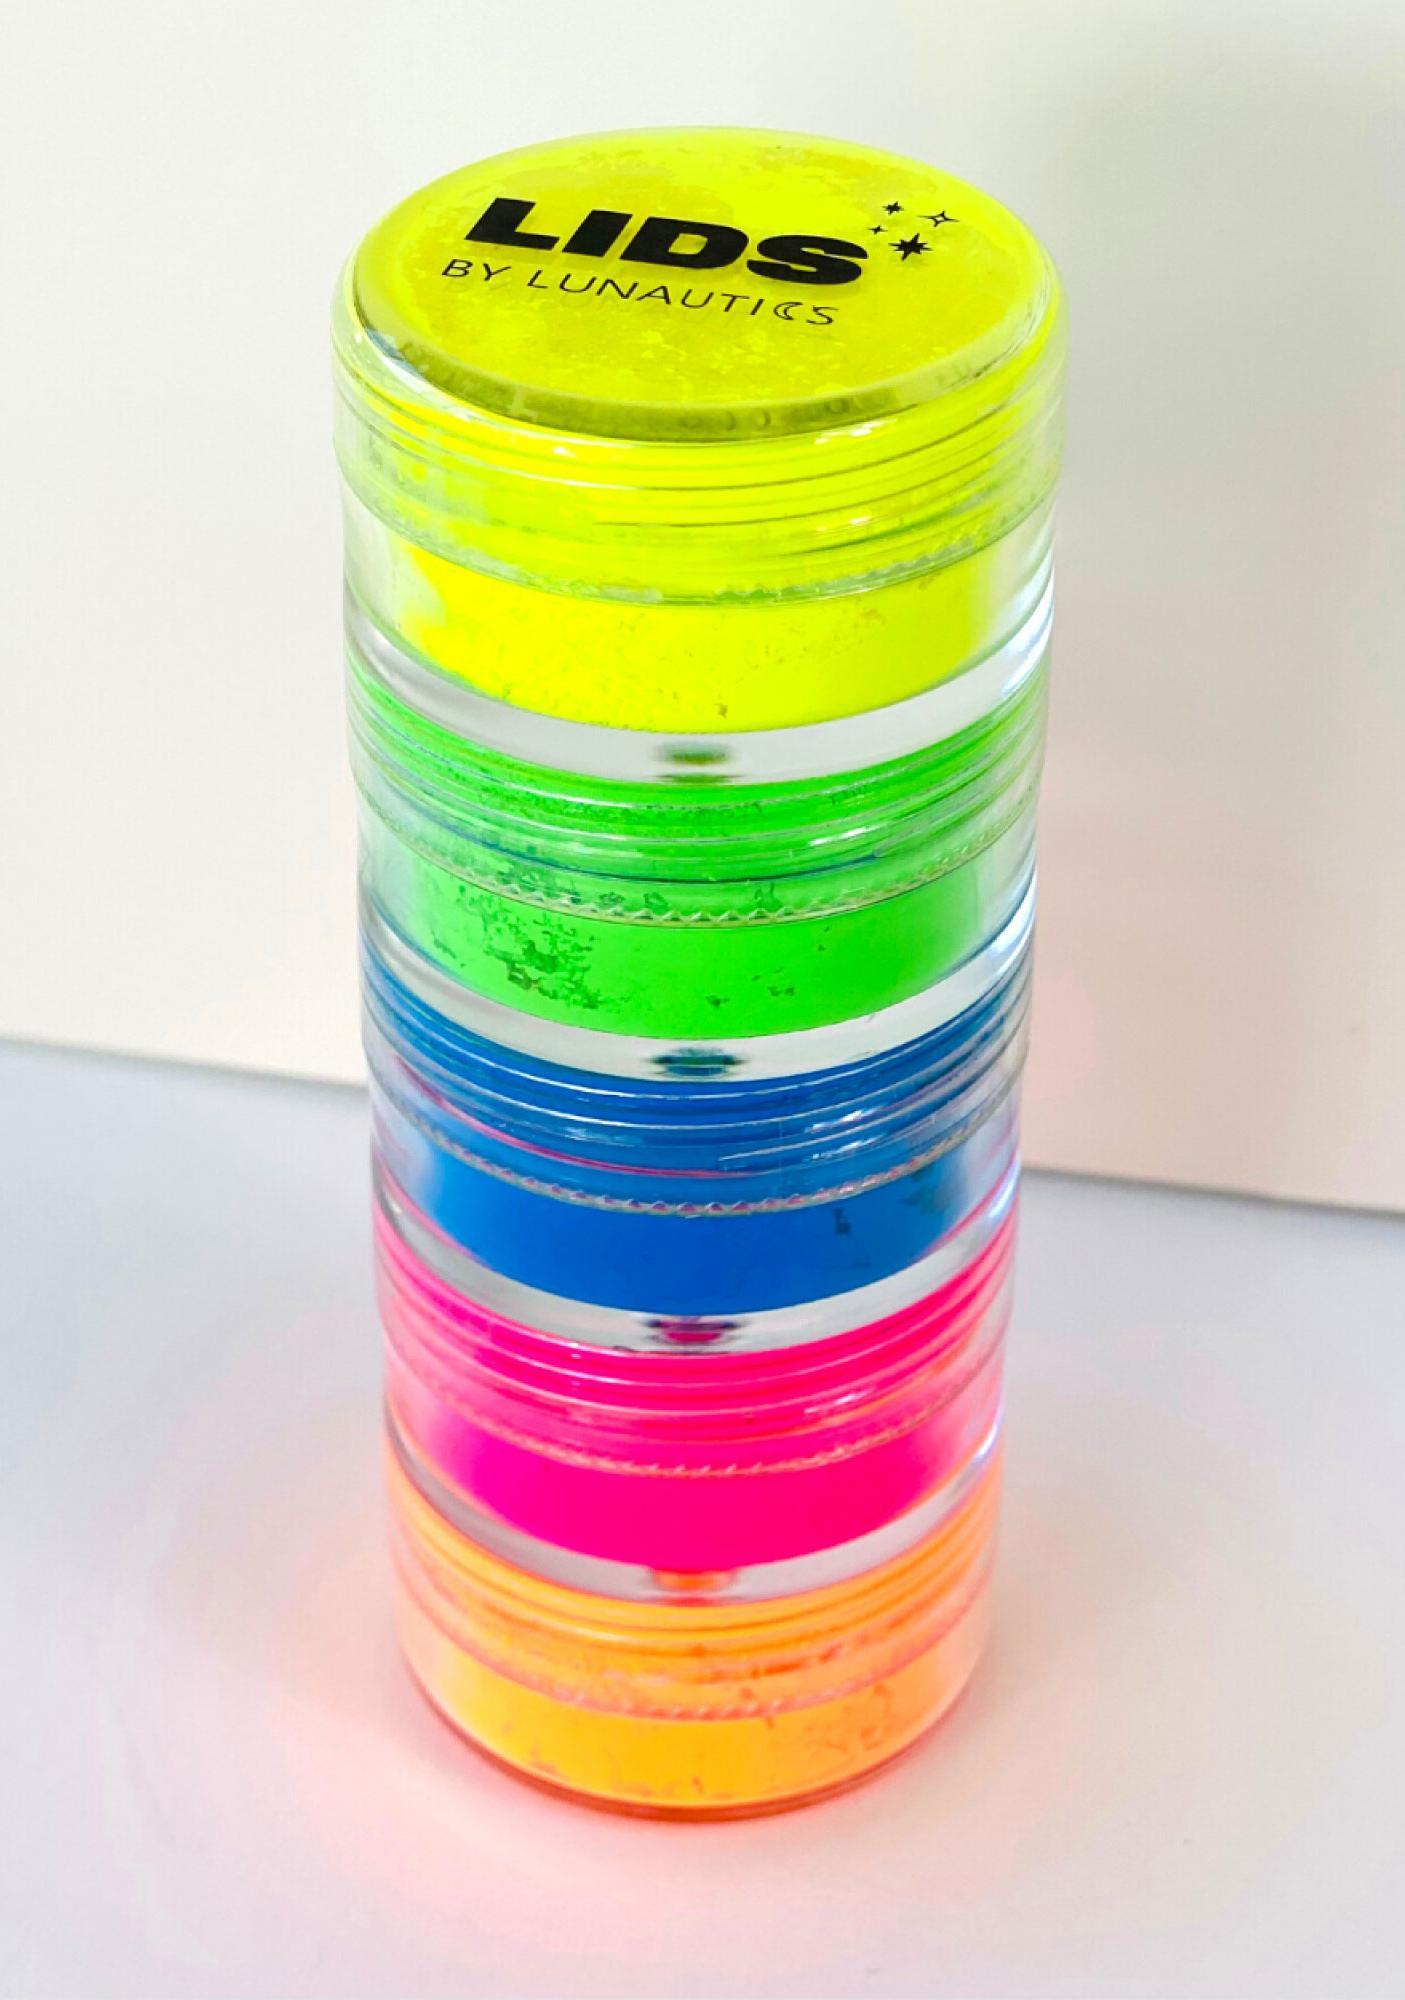 Lunautics Neon Beats Eye Pigments Set